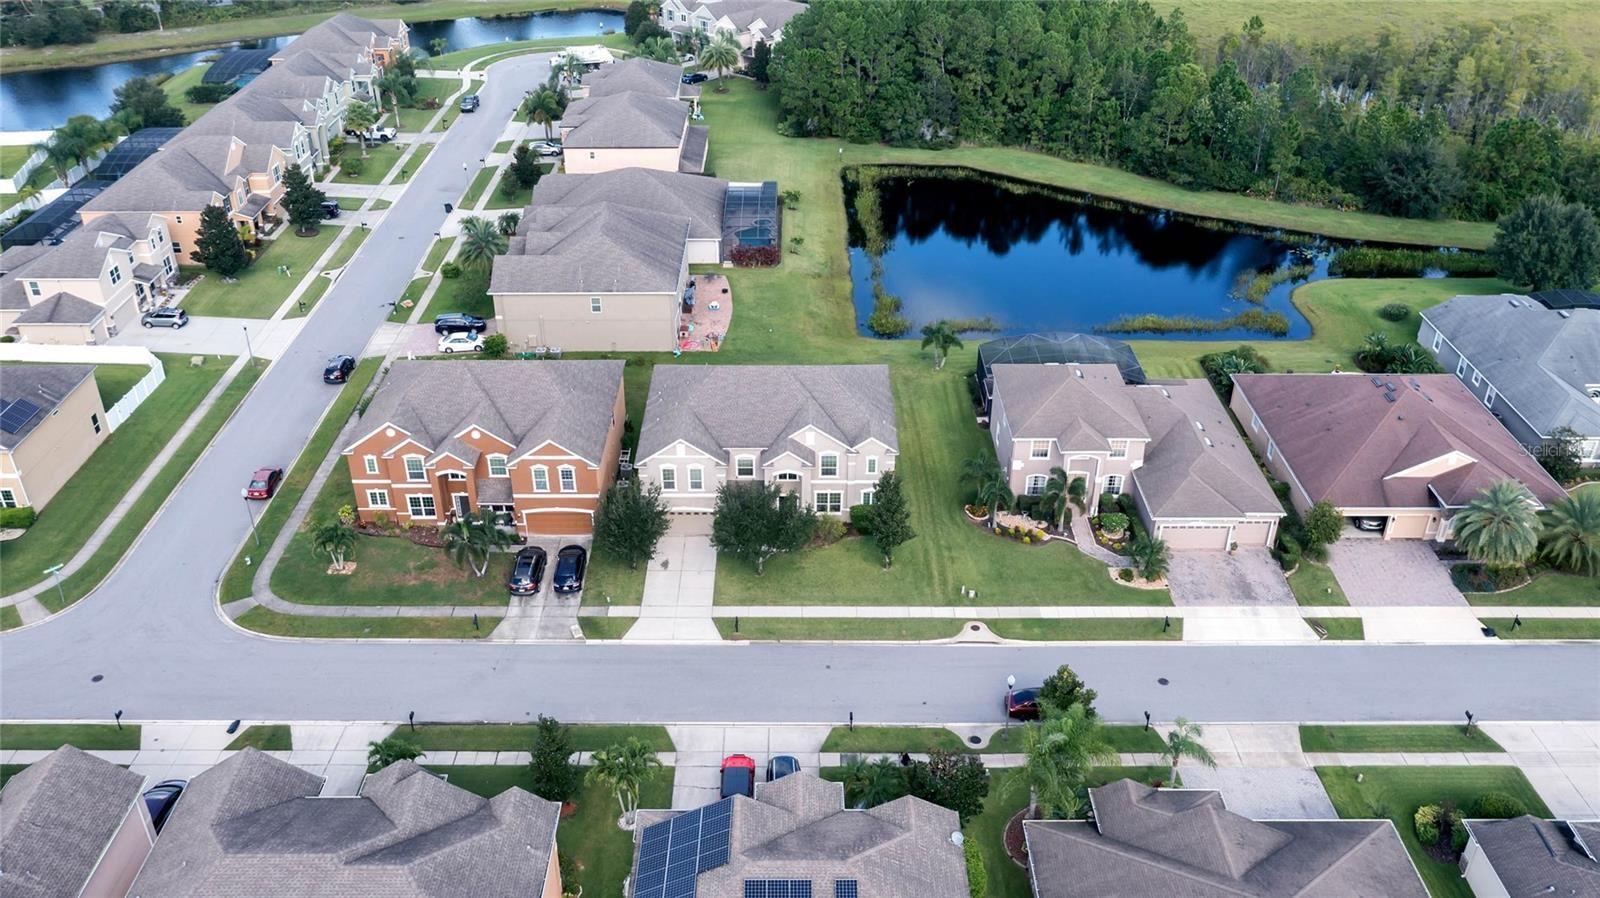 Photo of 2034 HAWKS LANDING DRIVE, ORLANDO, FL 32820 (MLS # O5974705)